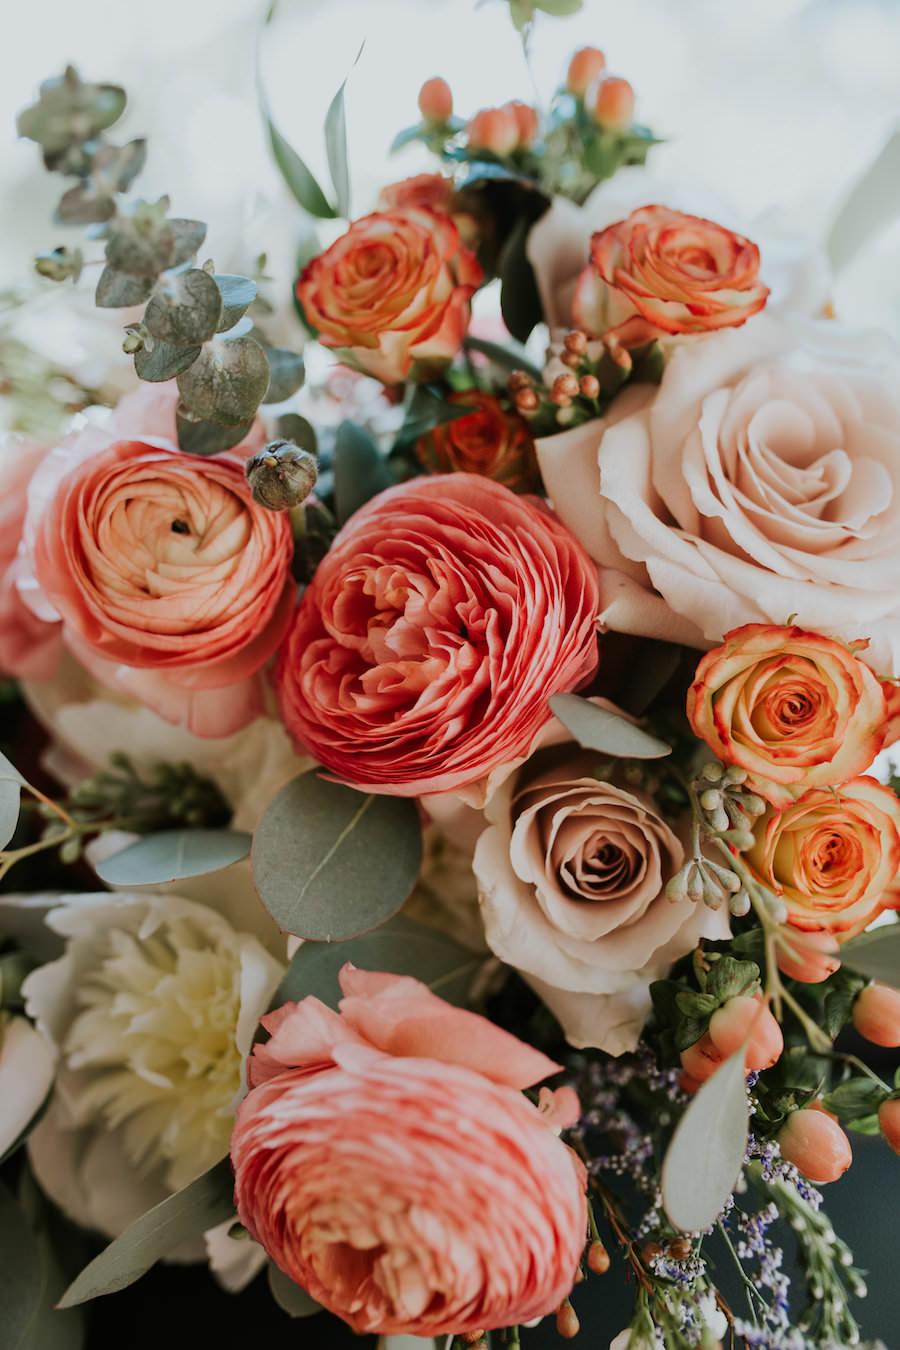 Peach and Blush Pink Wedding Bouquet with Greenery   Vintage Boho Wedding Inspiration   Tampa Wedding Florist Northside Florist